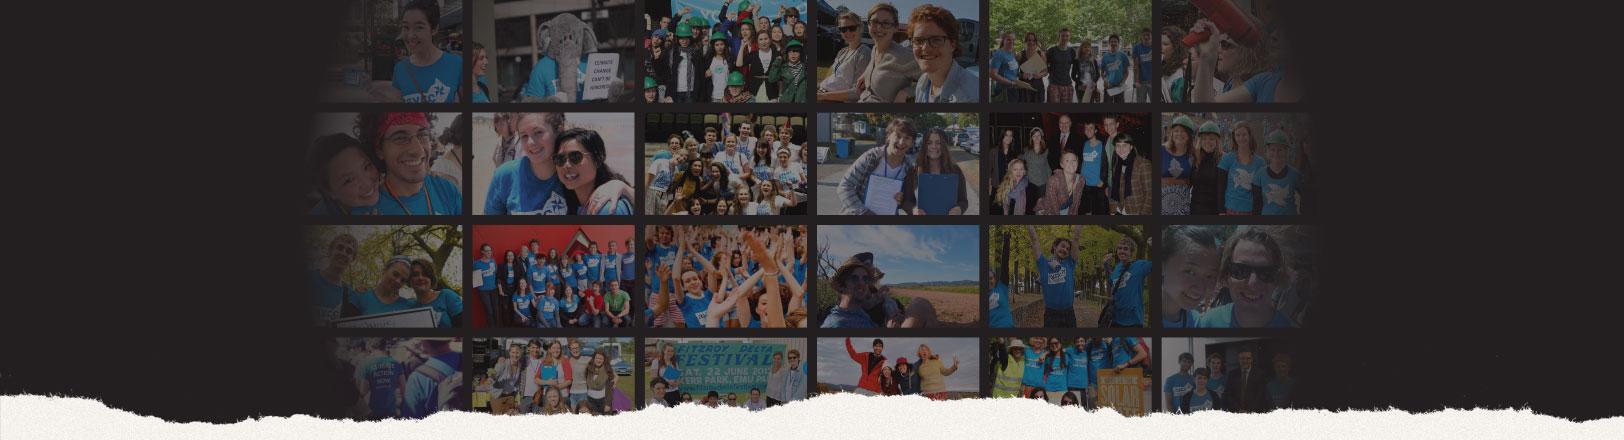 Canberra Volunteer info night